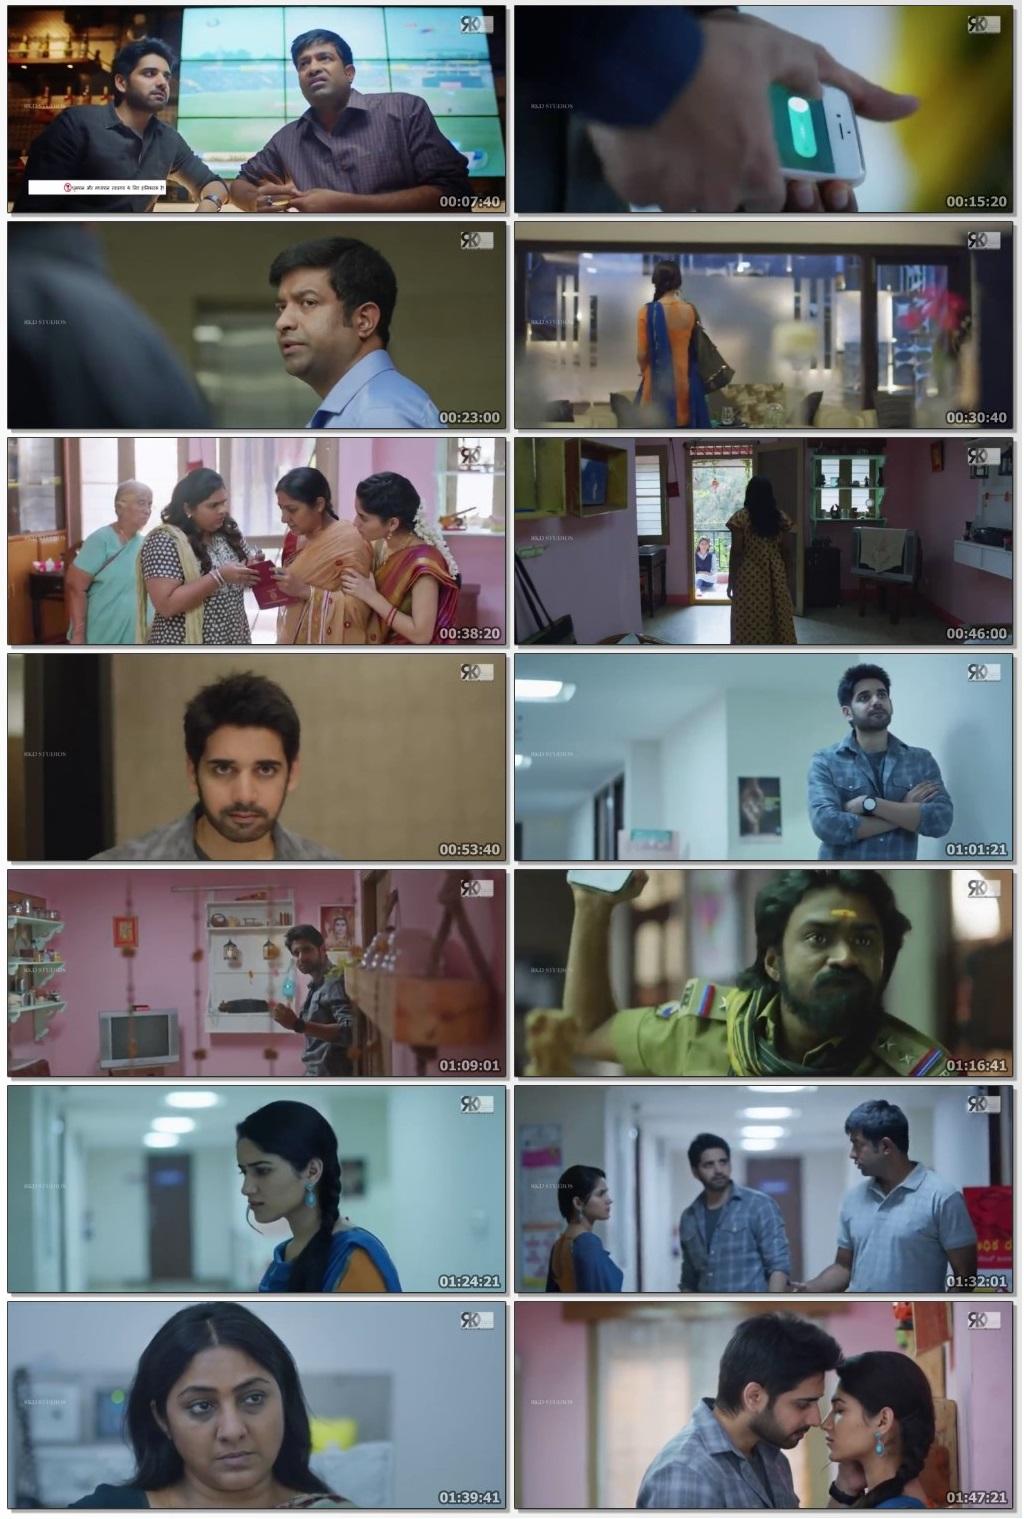 Arjun Ki Dulhaniya (Chi La Sow) 2019 Hindi Dubbed 550MB HDRip 720p